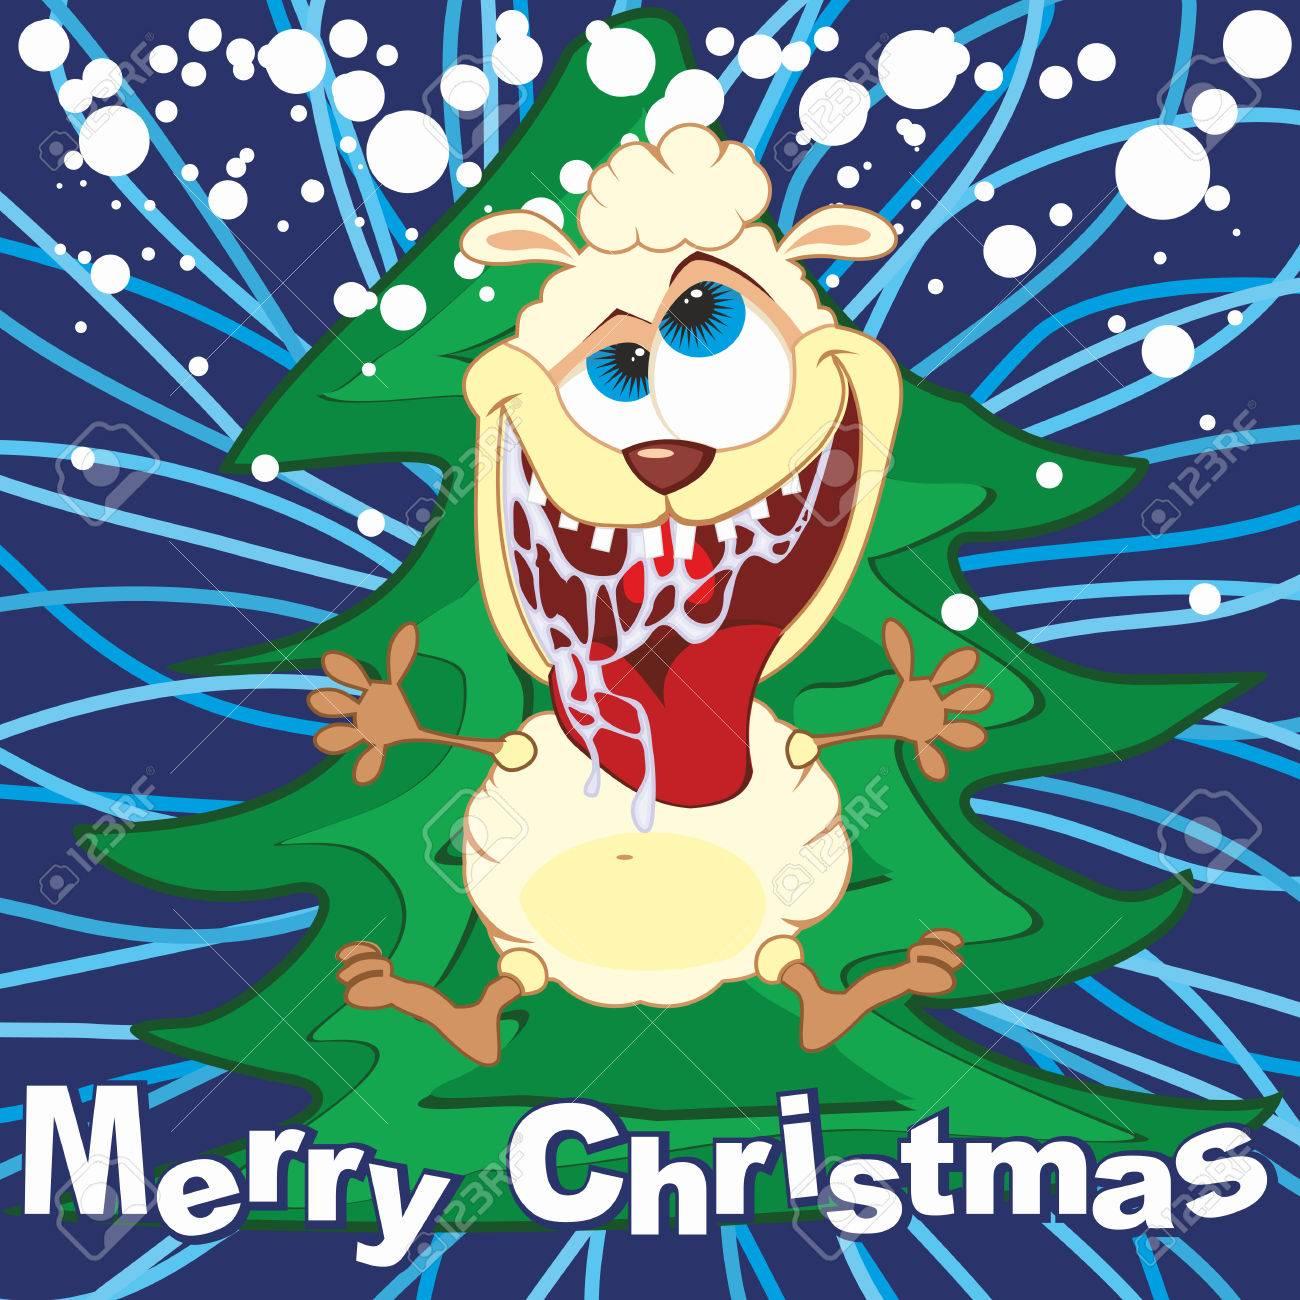 cartoon funny sheep illustration merry christmas greeting card stock vector 32543574 - Funny Merry Christmas Greetings